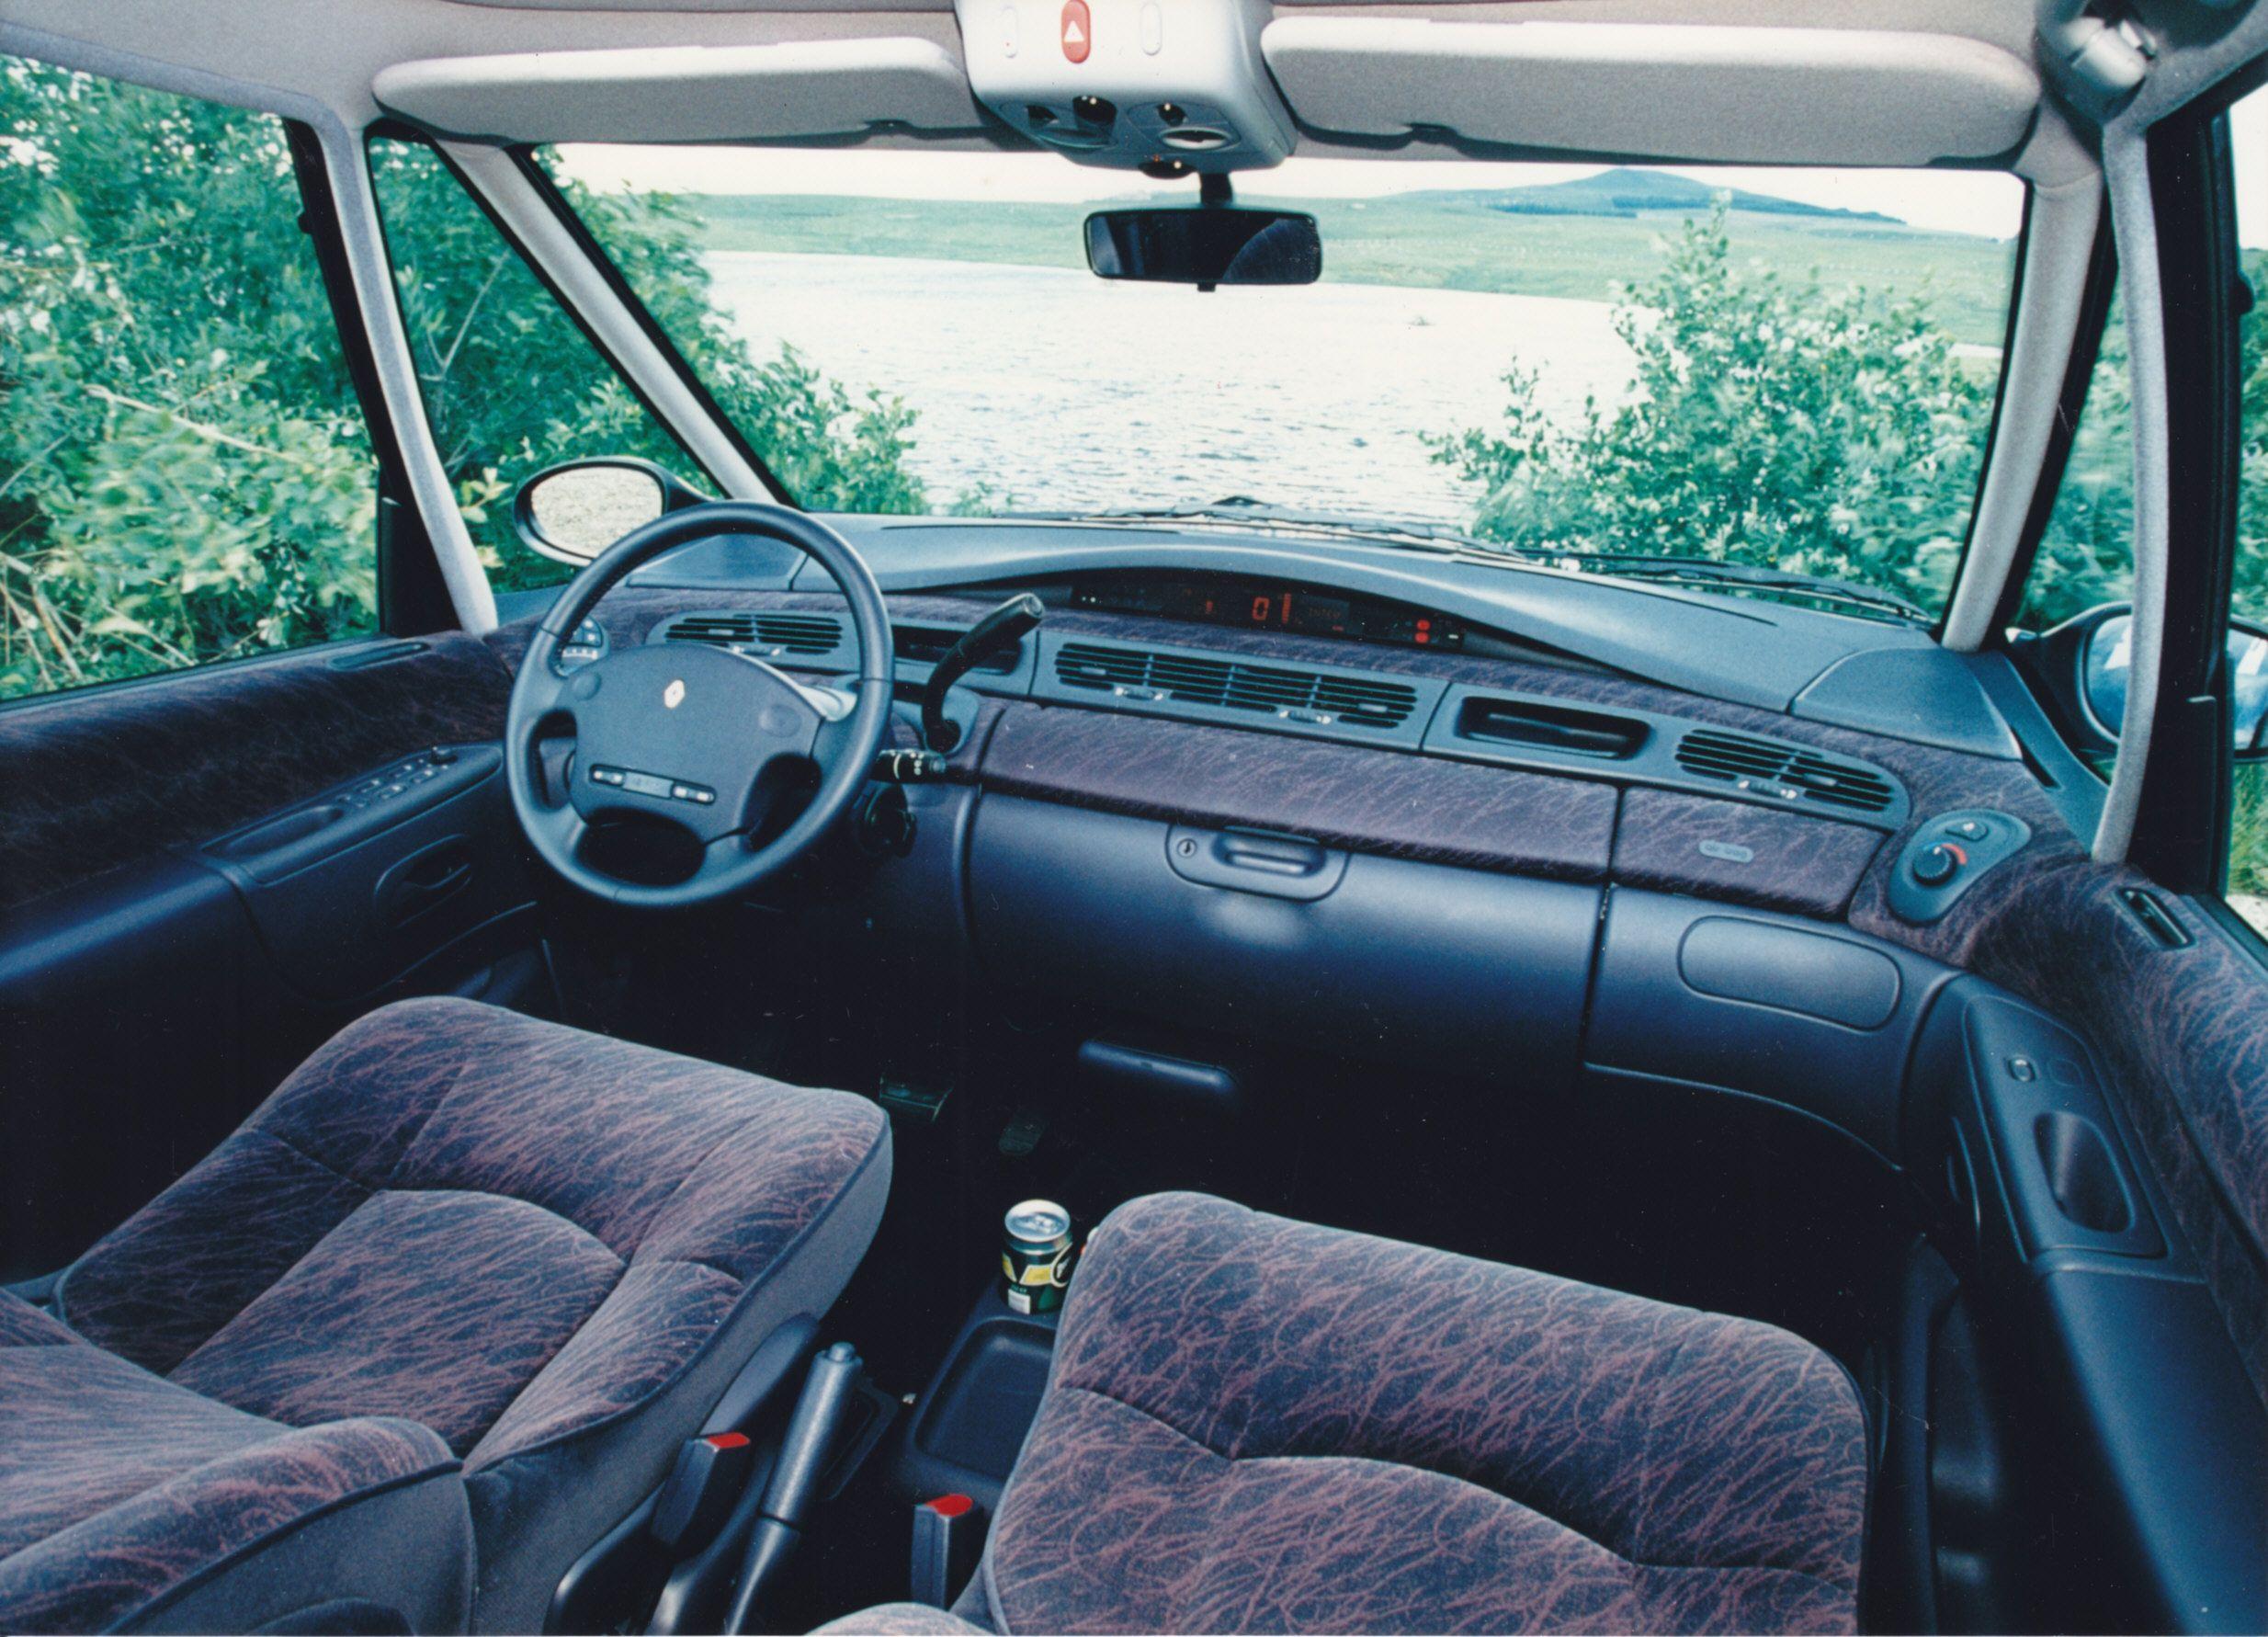 Renault Espace Interior Dashboard